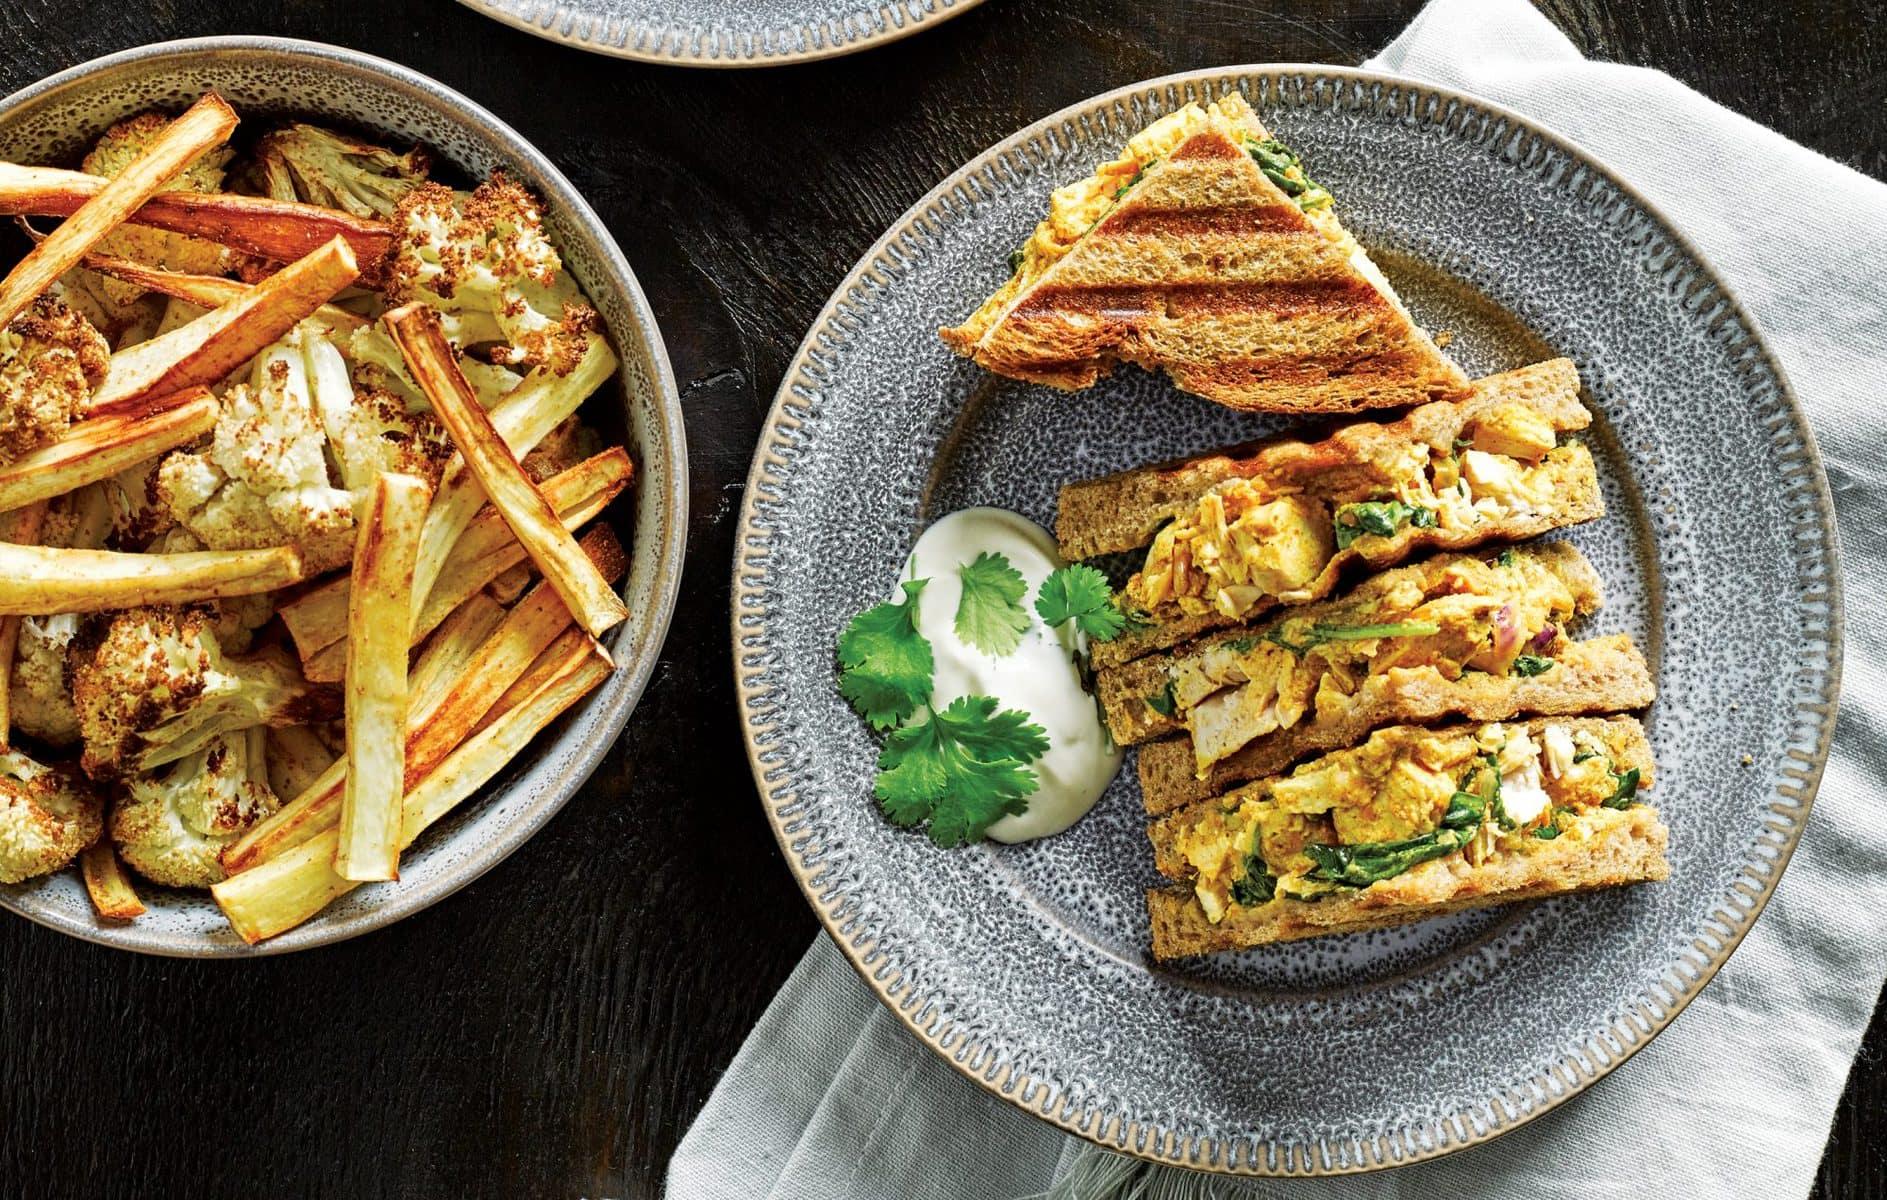 Chicken tikka toasties with vege bites